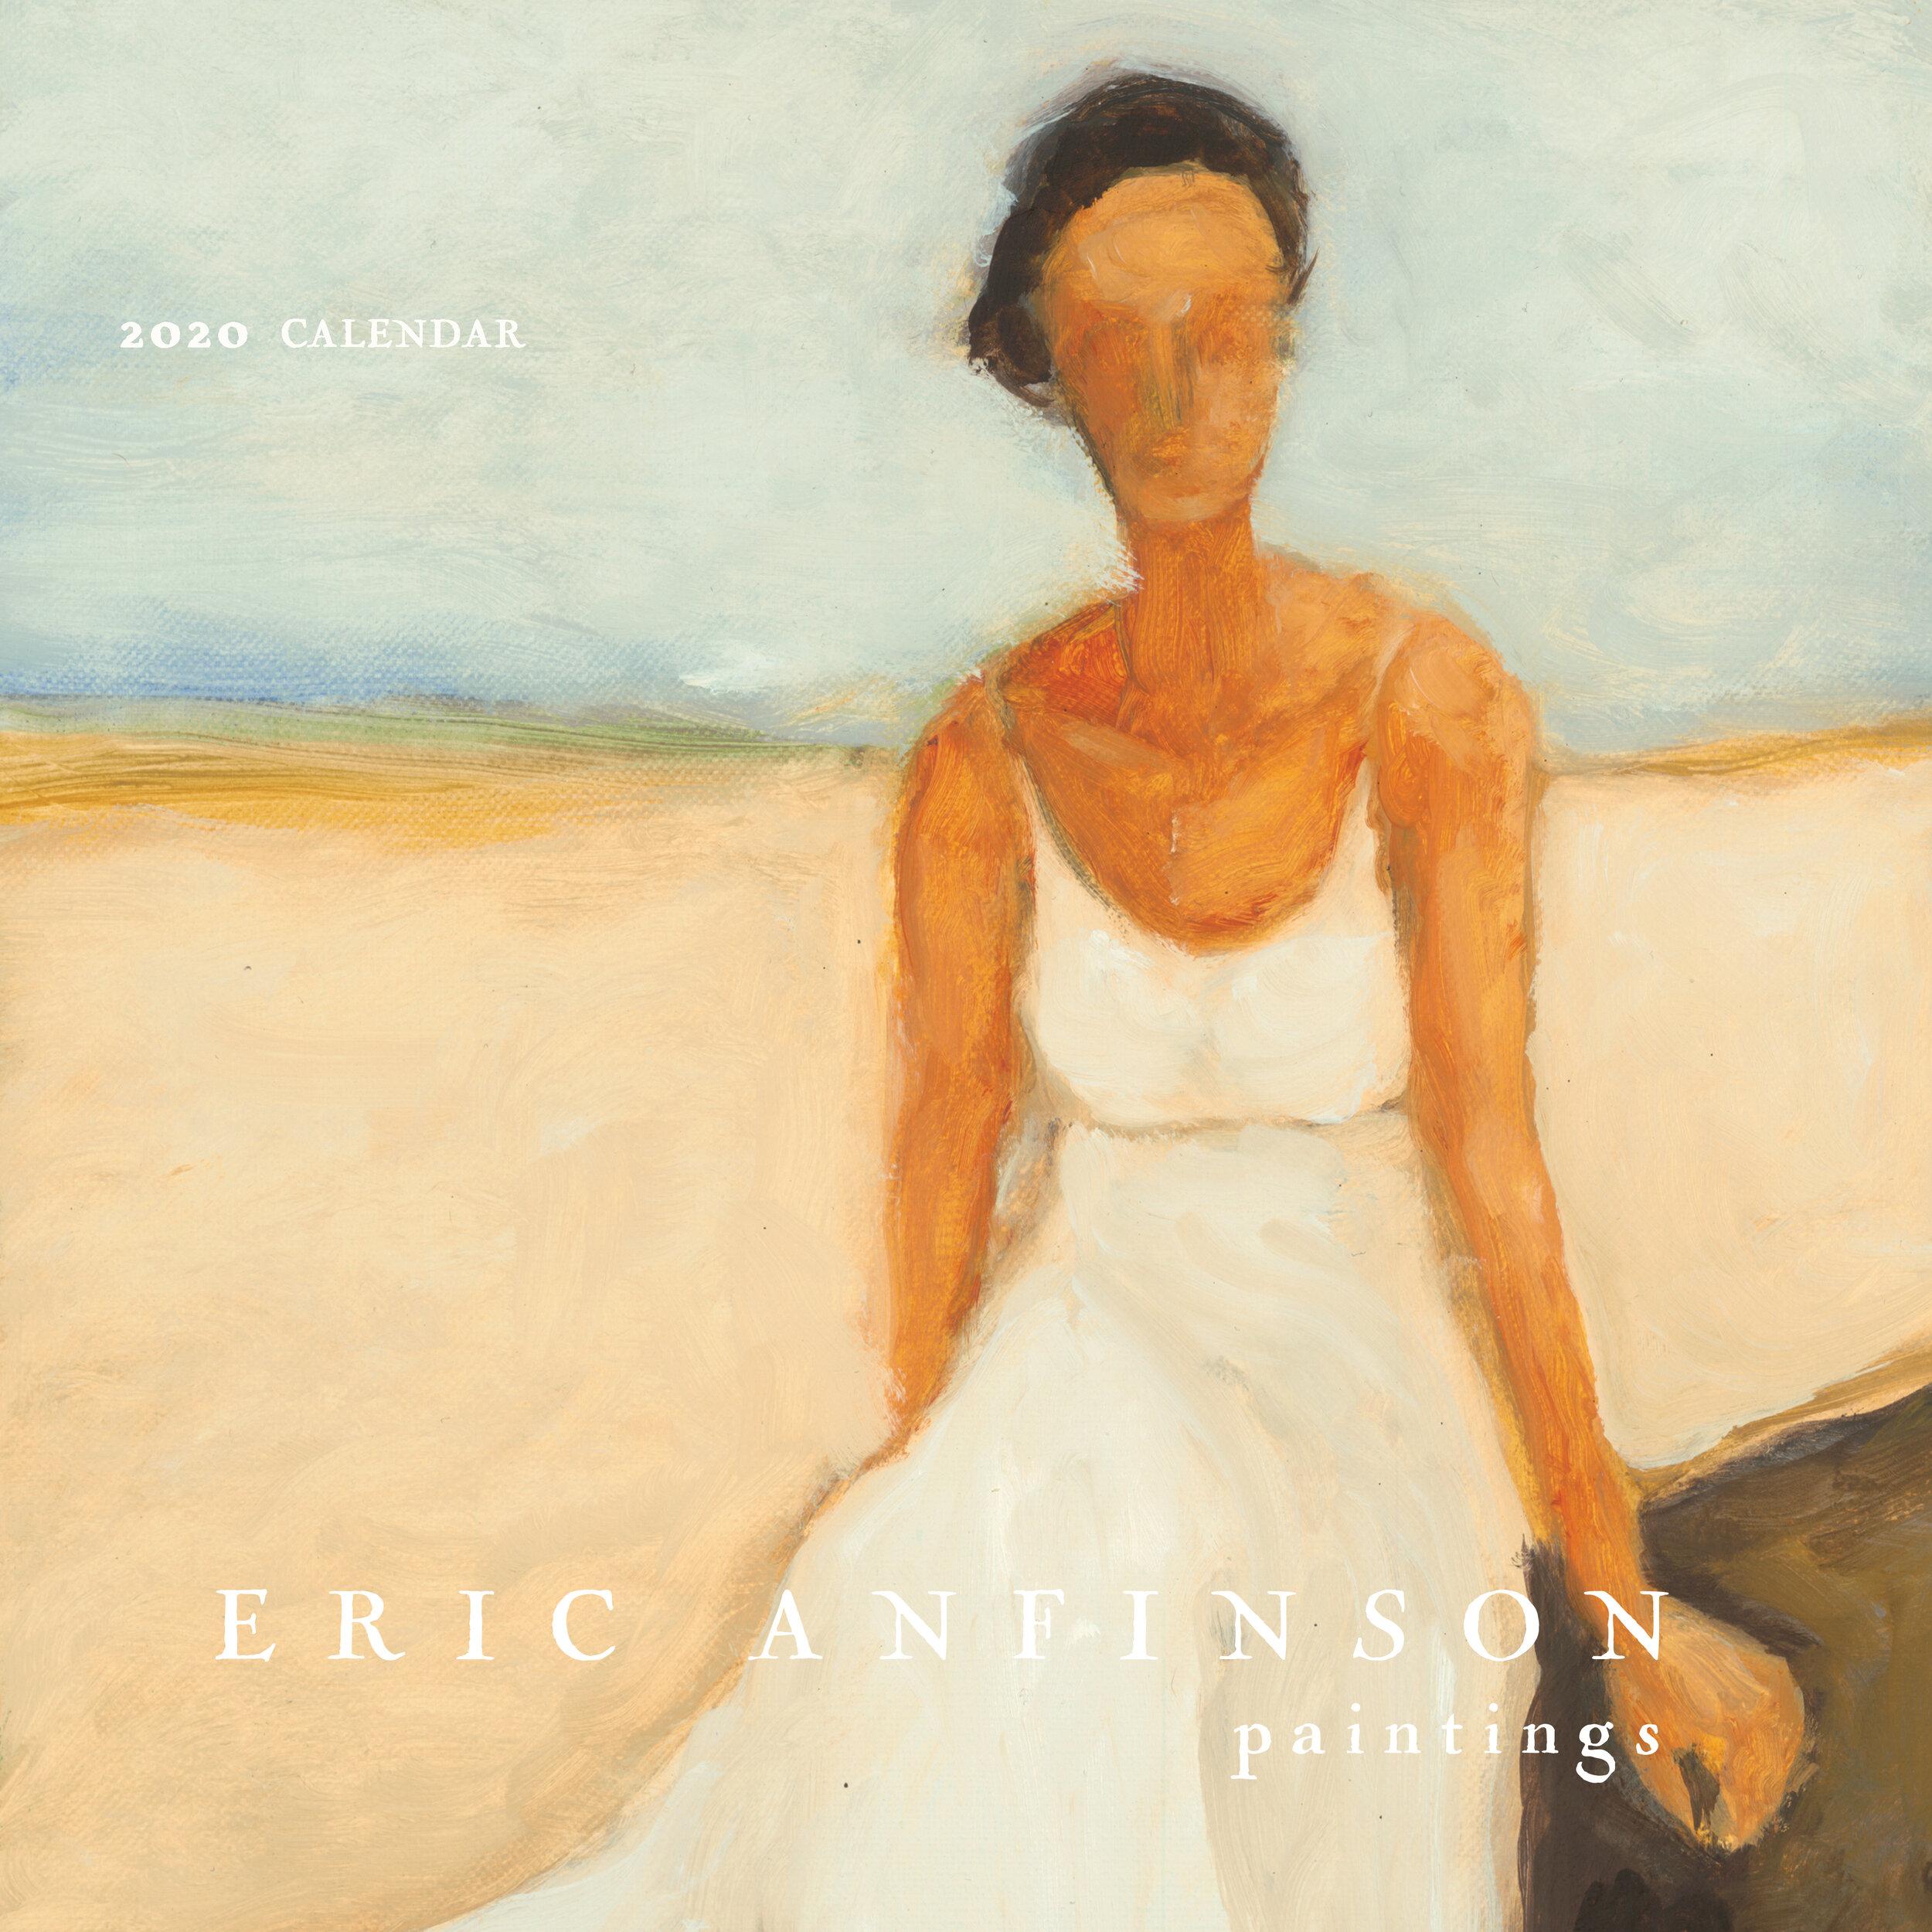 Eric Anfinson 2020 oil painting art calendar key west.jpg